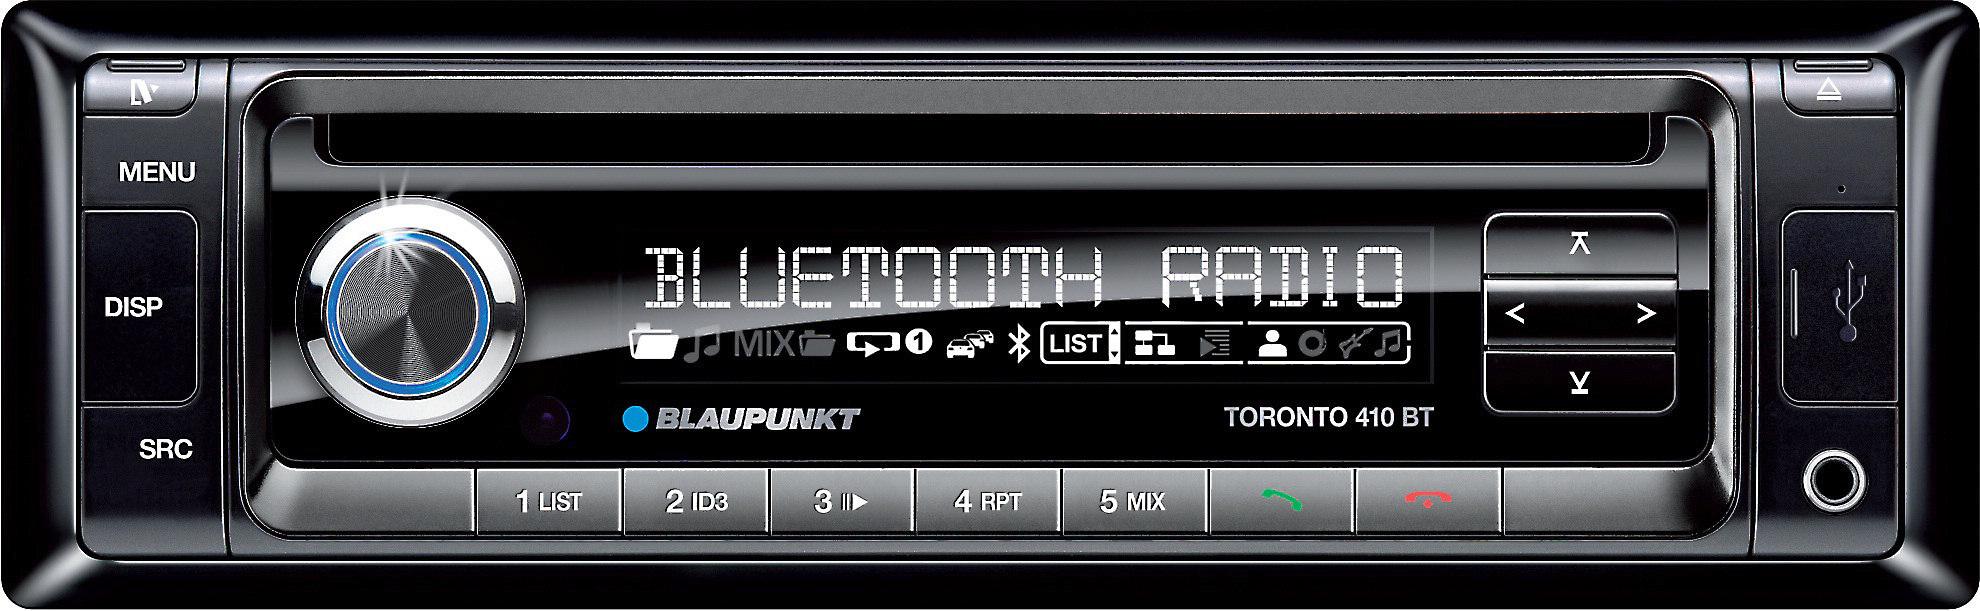 Blaupunkt 410 BT Toronto Car Radio